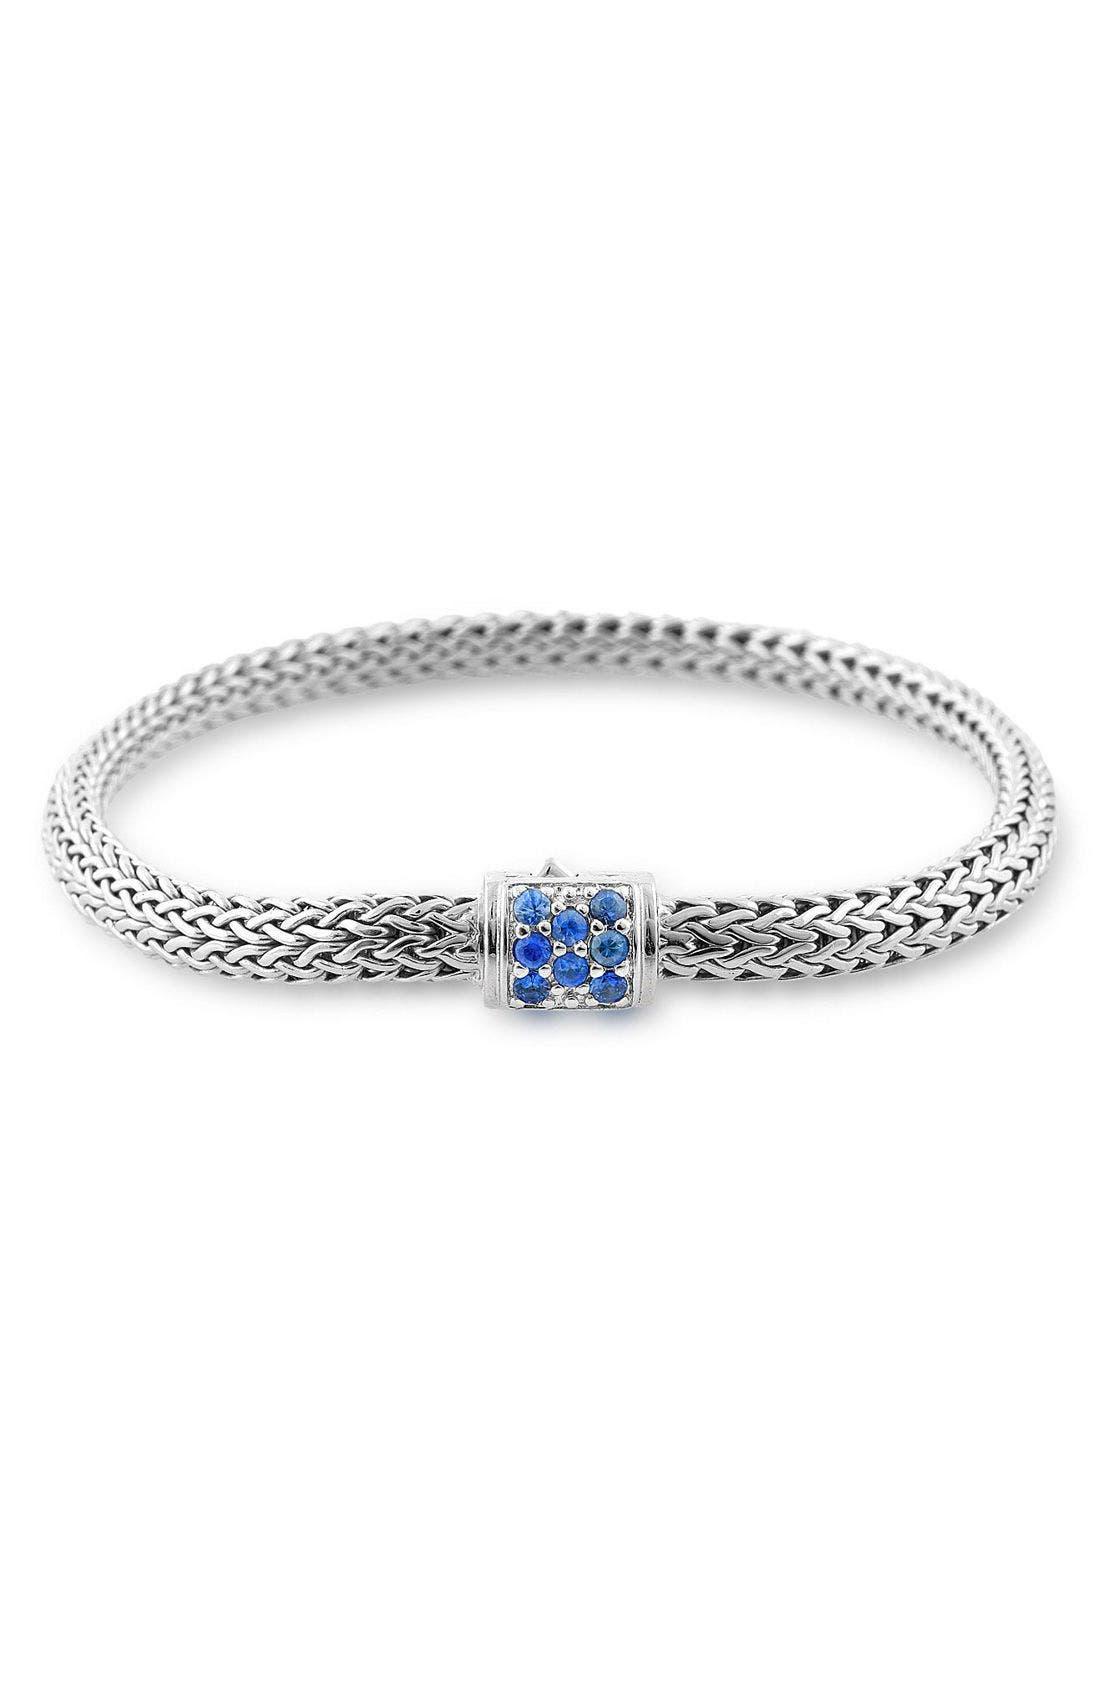 Main Image - John Hardy 'Classic Chain' Extra Small Bracelet